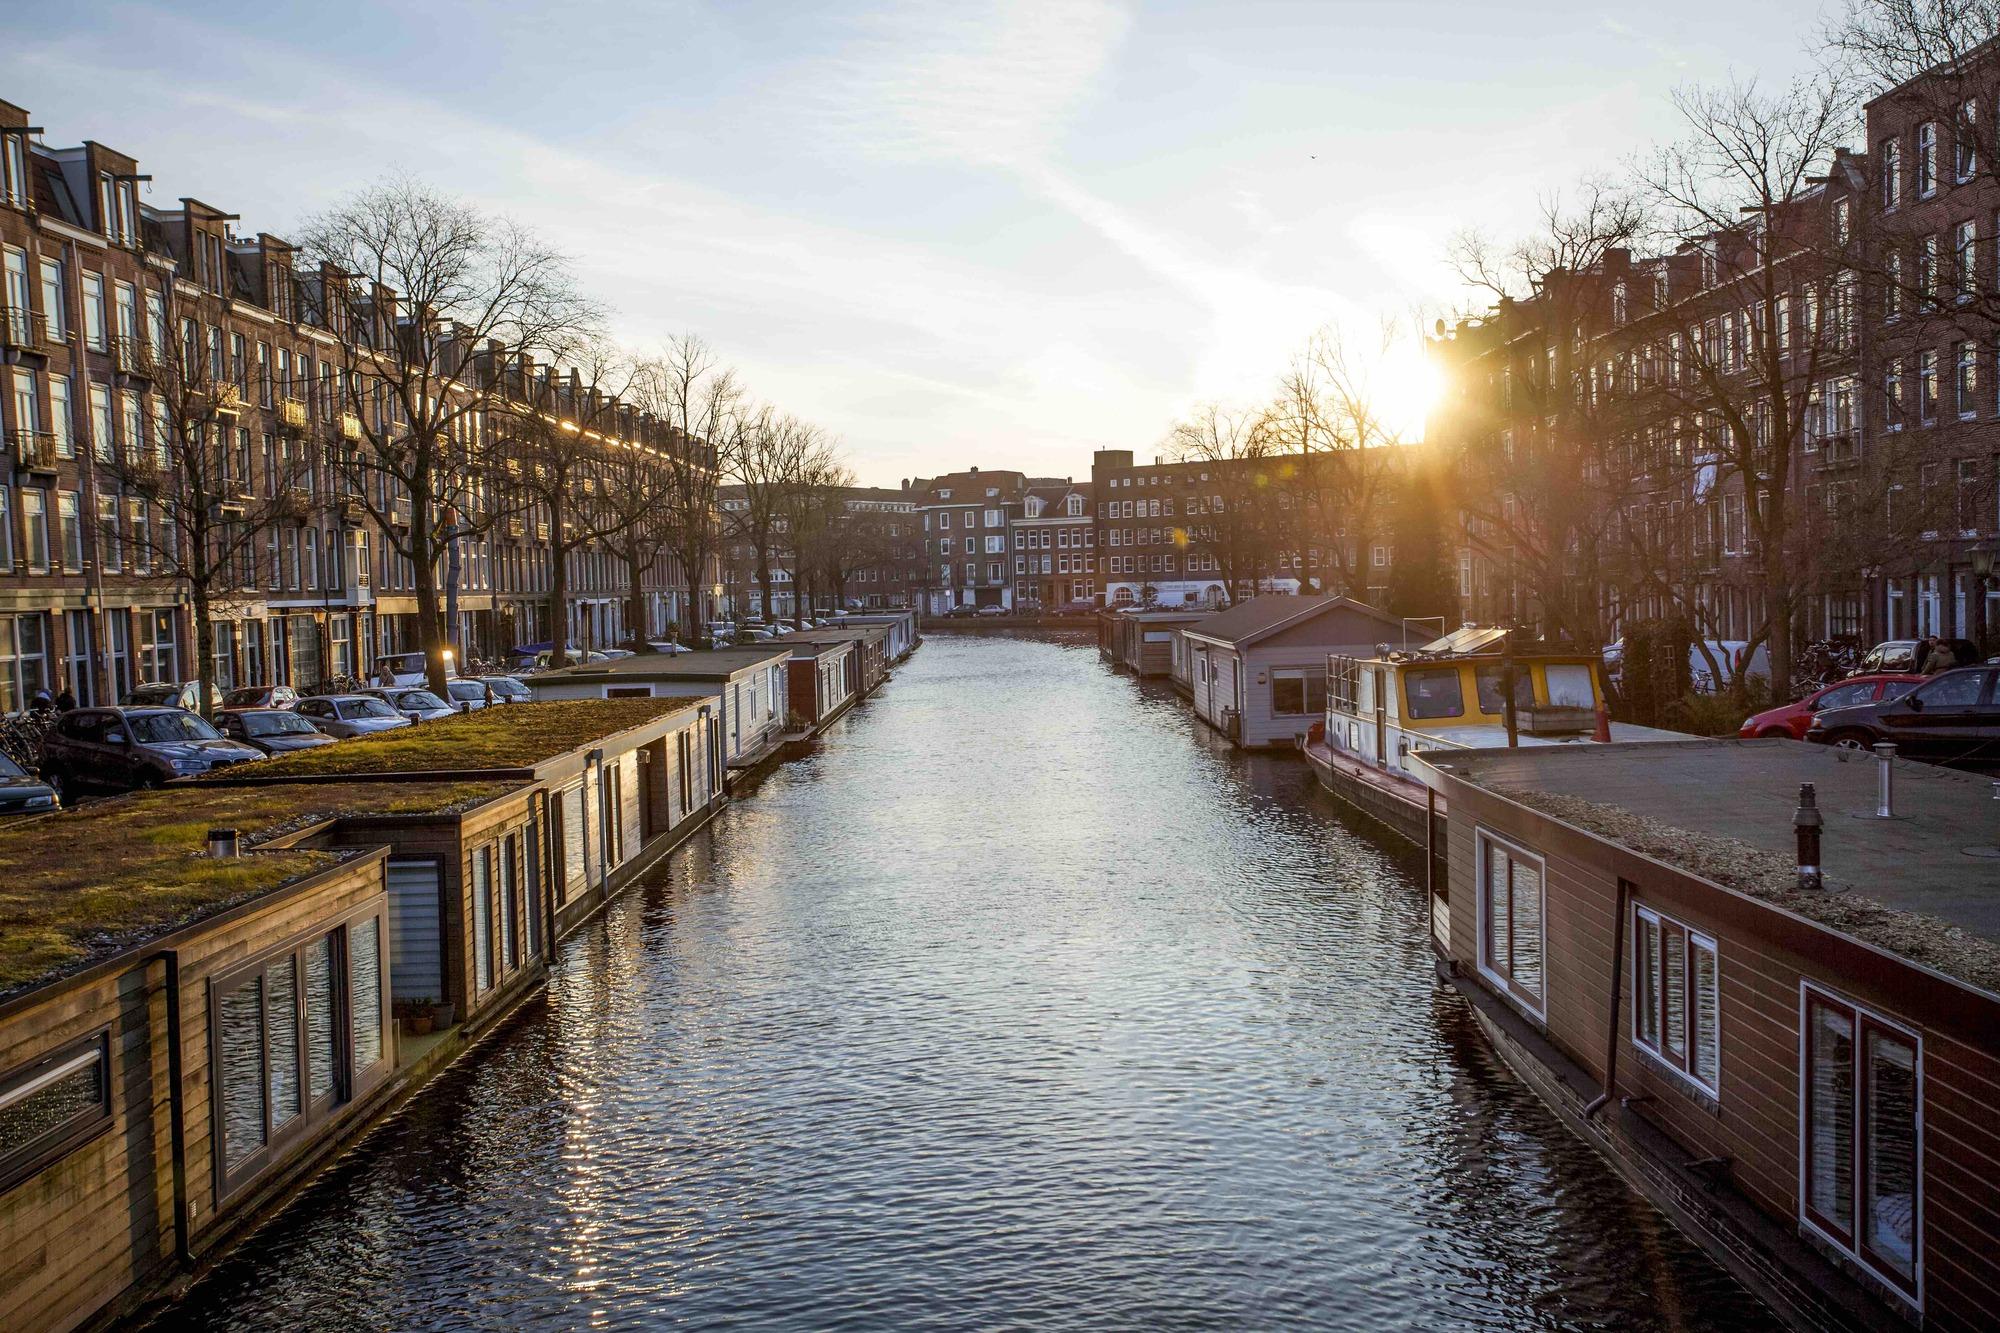 Oud West in Amsterdam